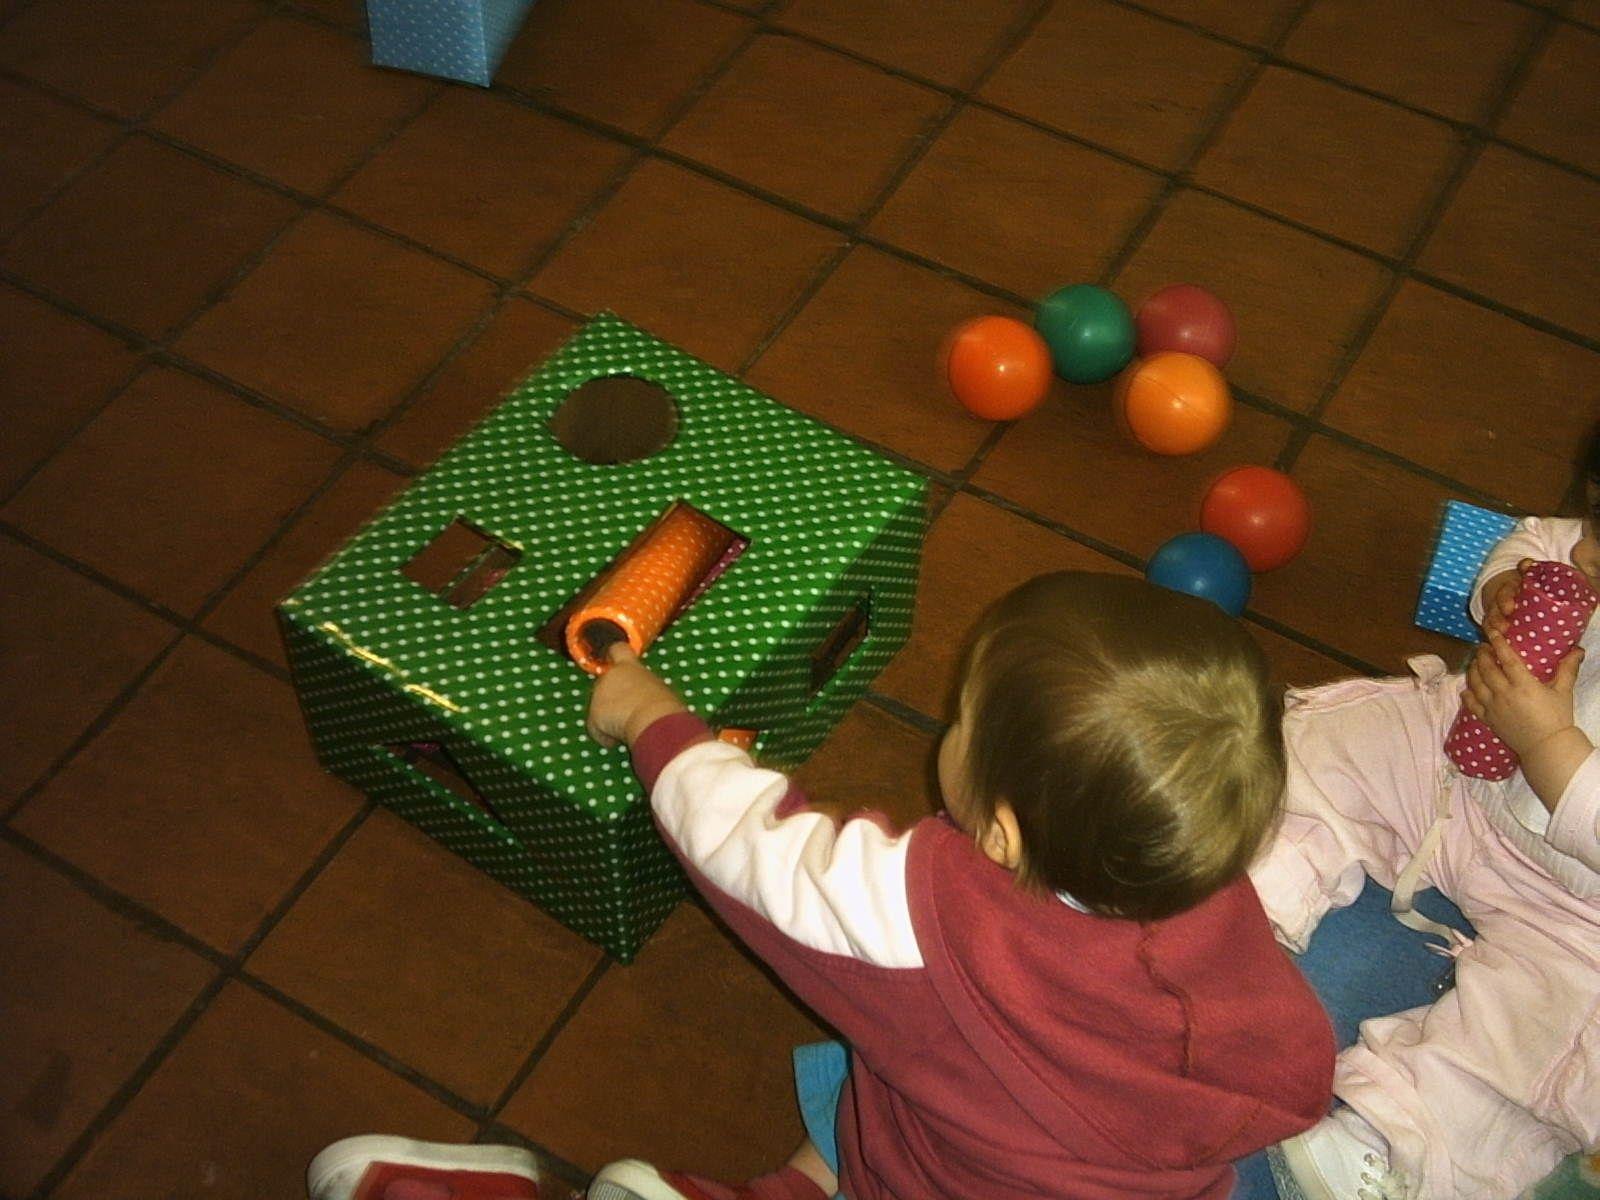 juegos jardin maternal - Buscar con Google | MATERNAL ...